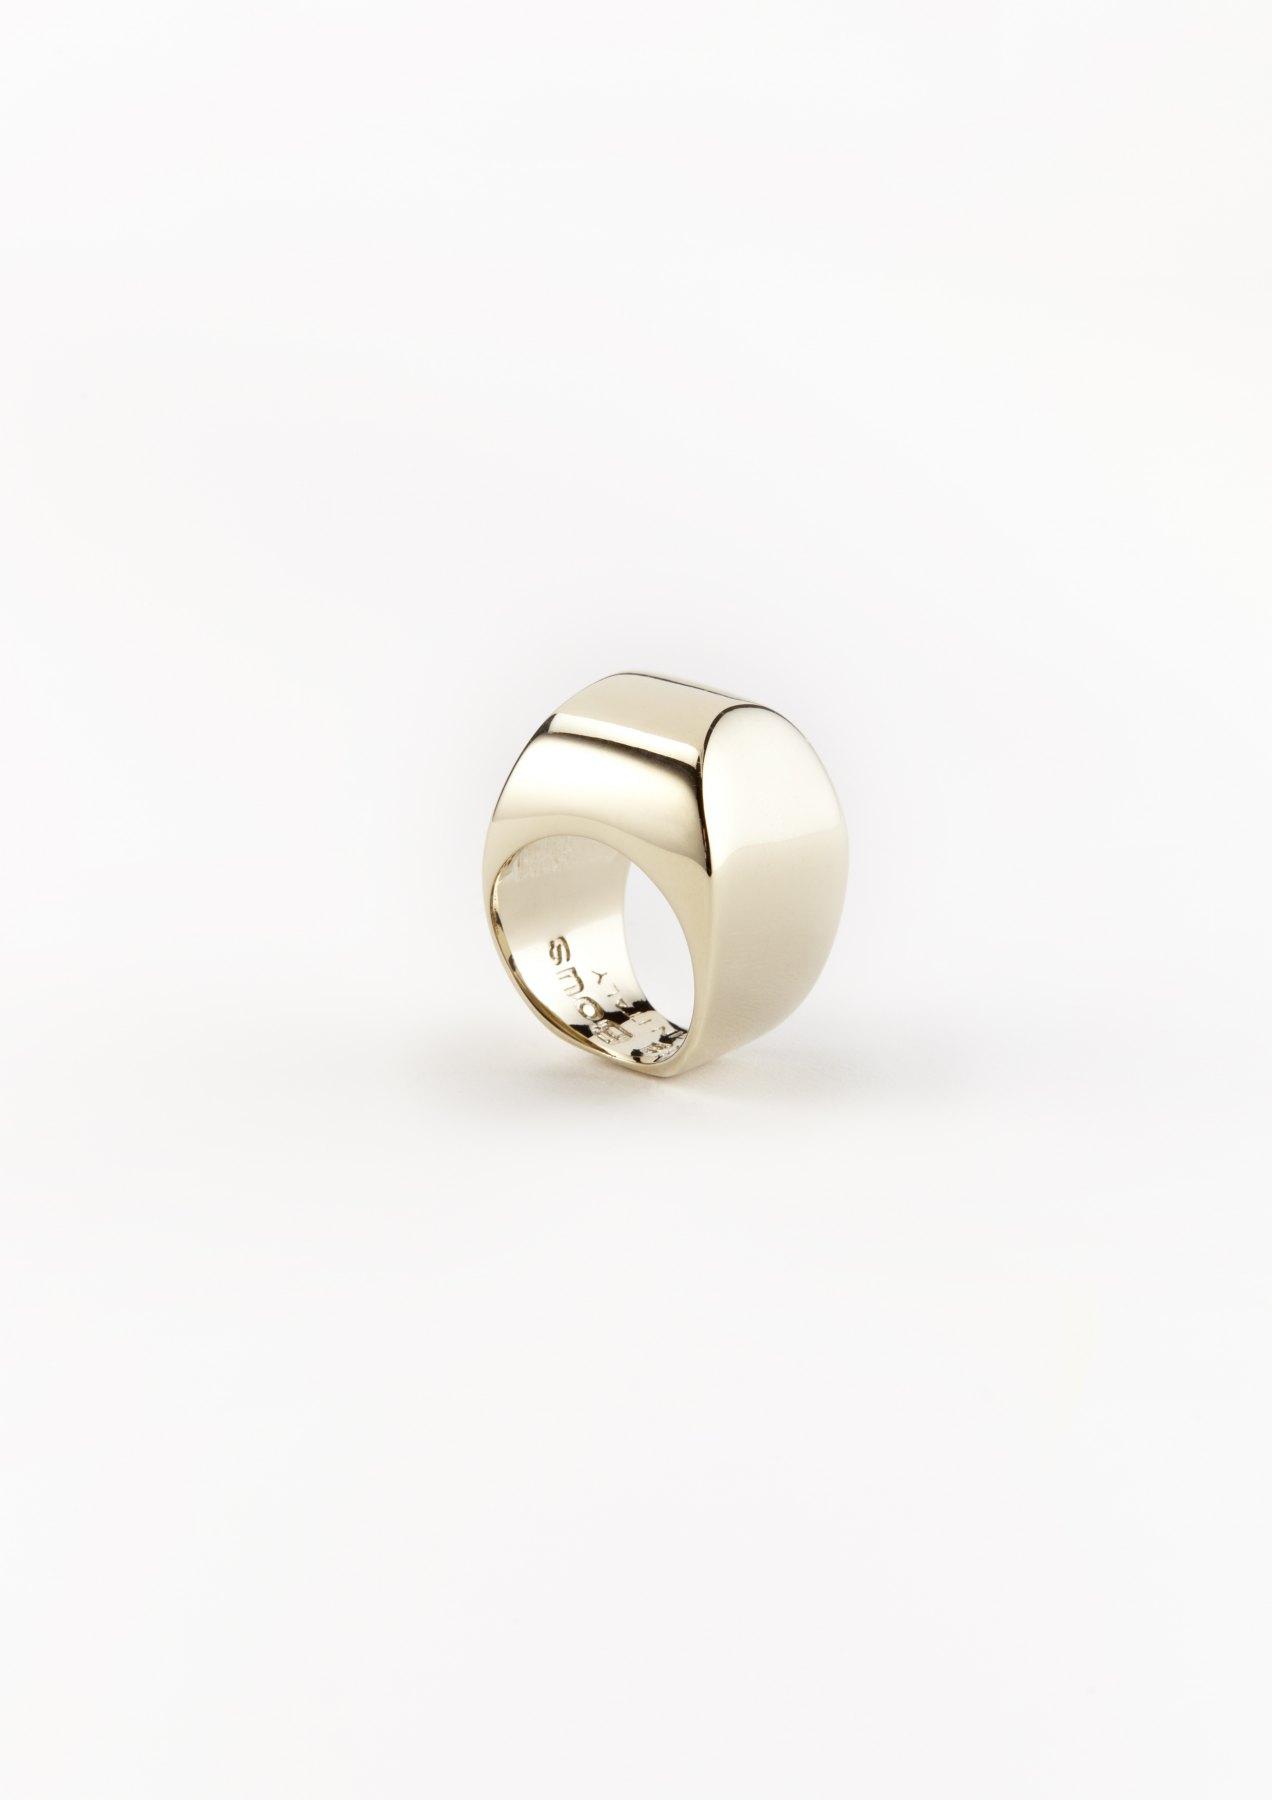 xenia bous schmuck Golden Stone 28 Ring gold silber